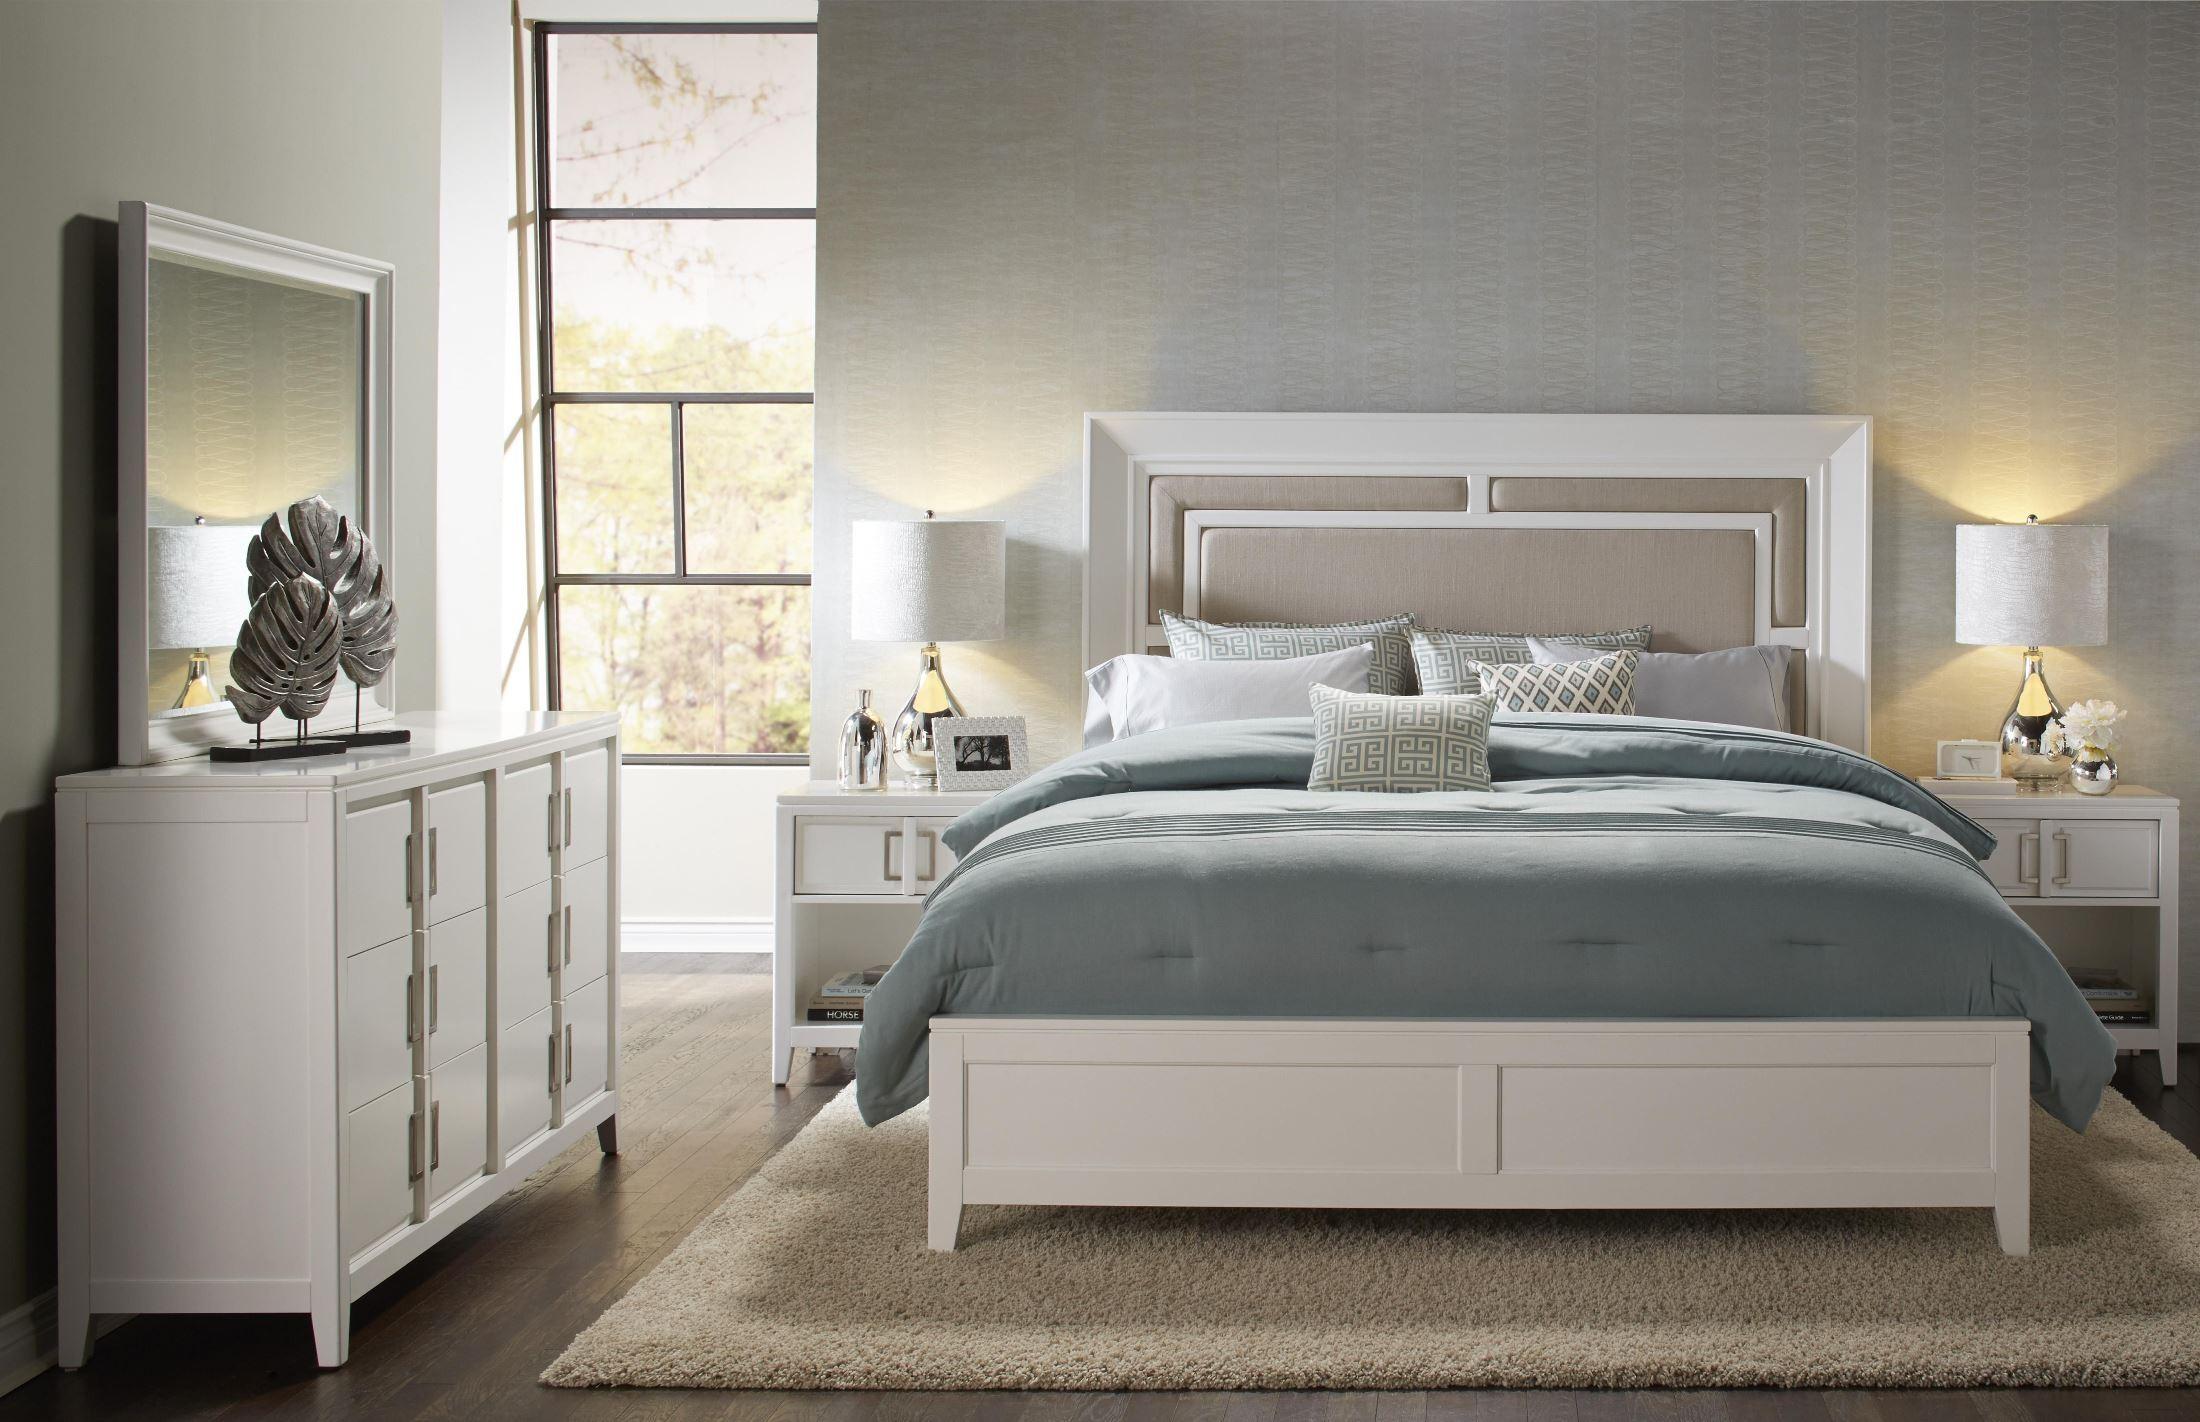 brighton white cal king size panel bed 8673 270 271 406 samuel lawrence. Black Bedroom Furniture Sets. Home Design Ideas